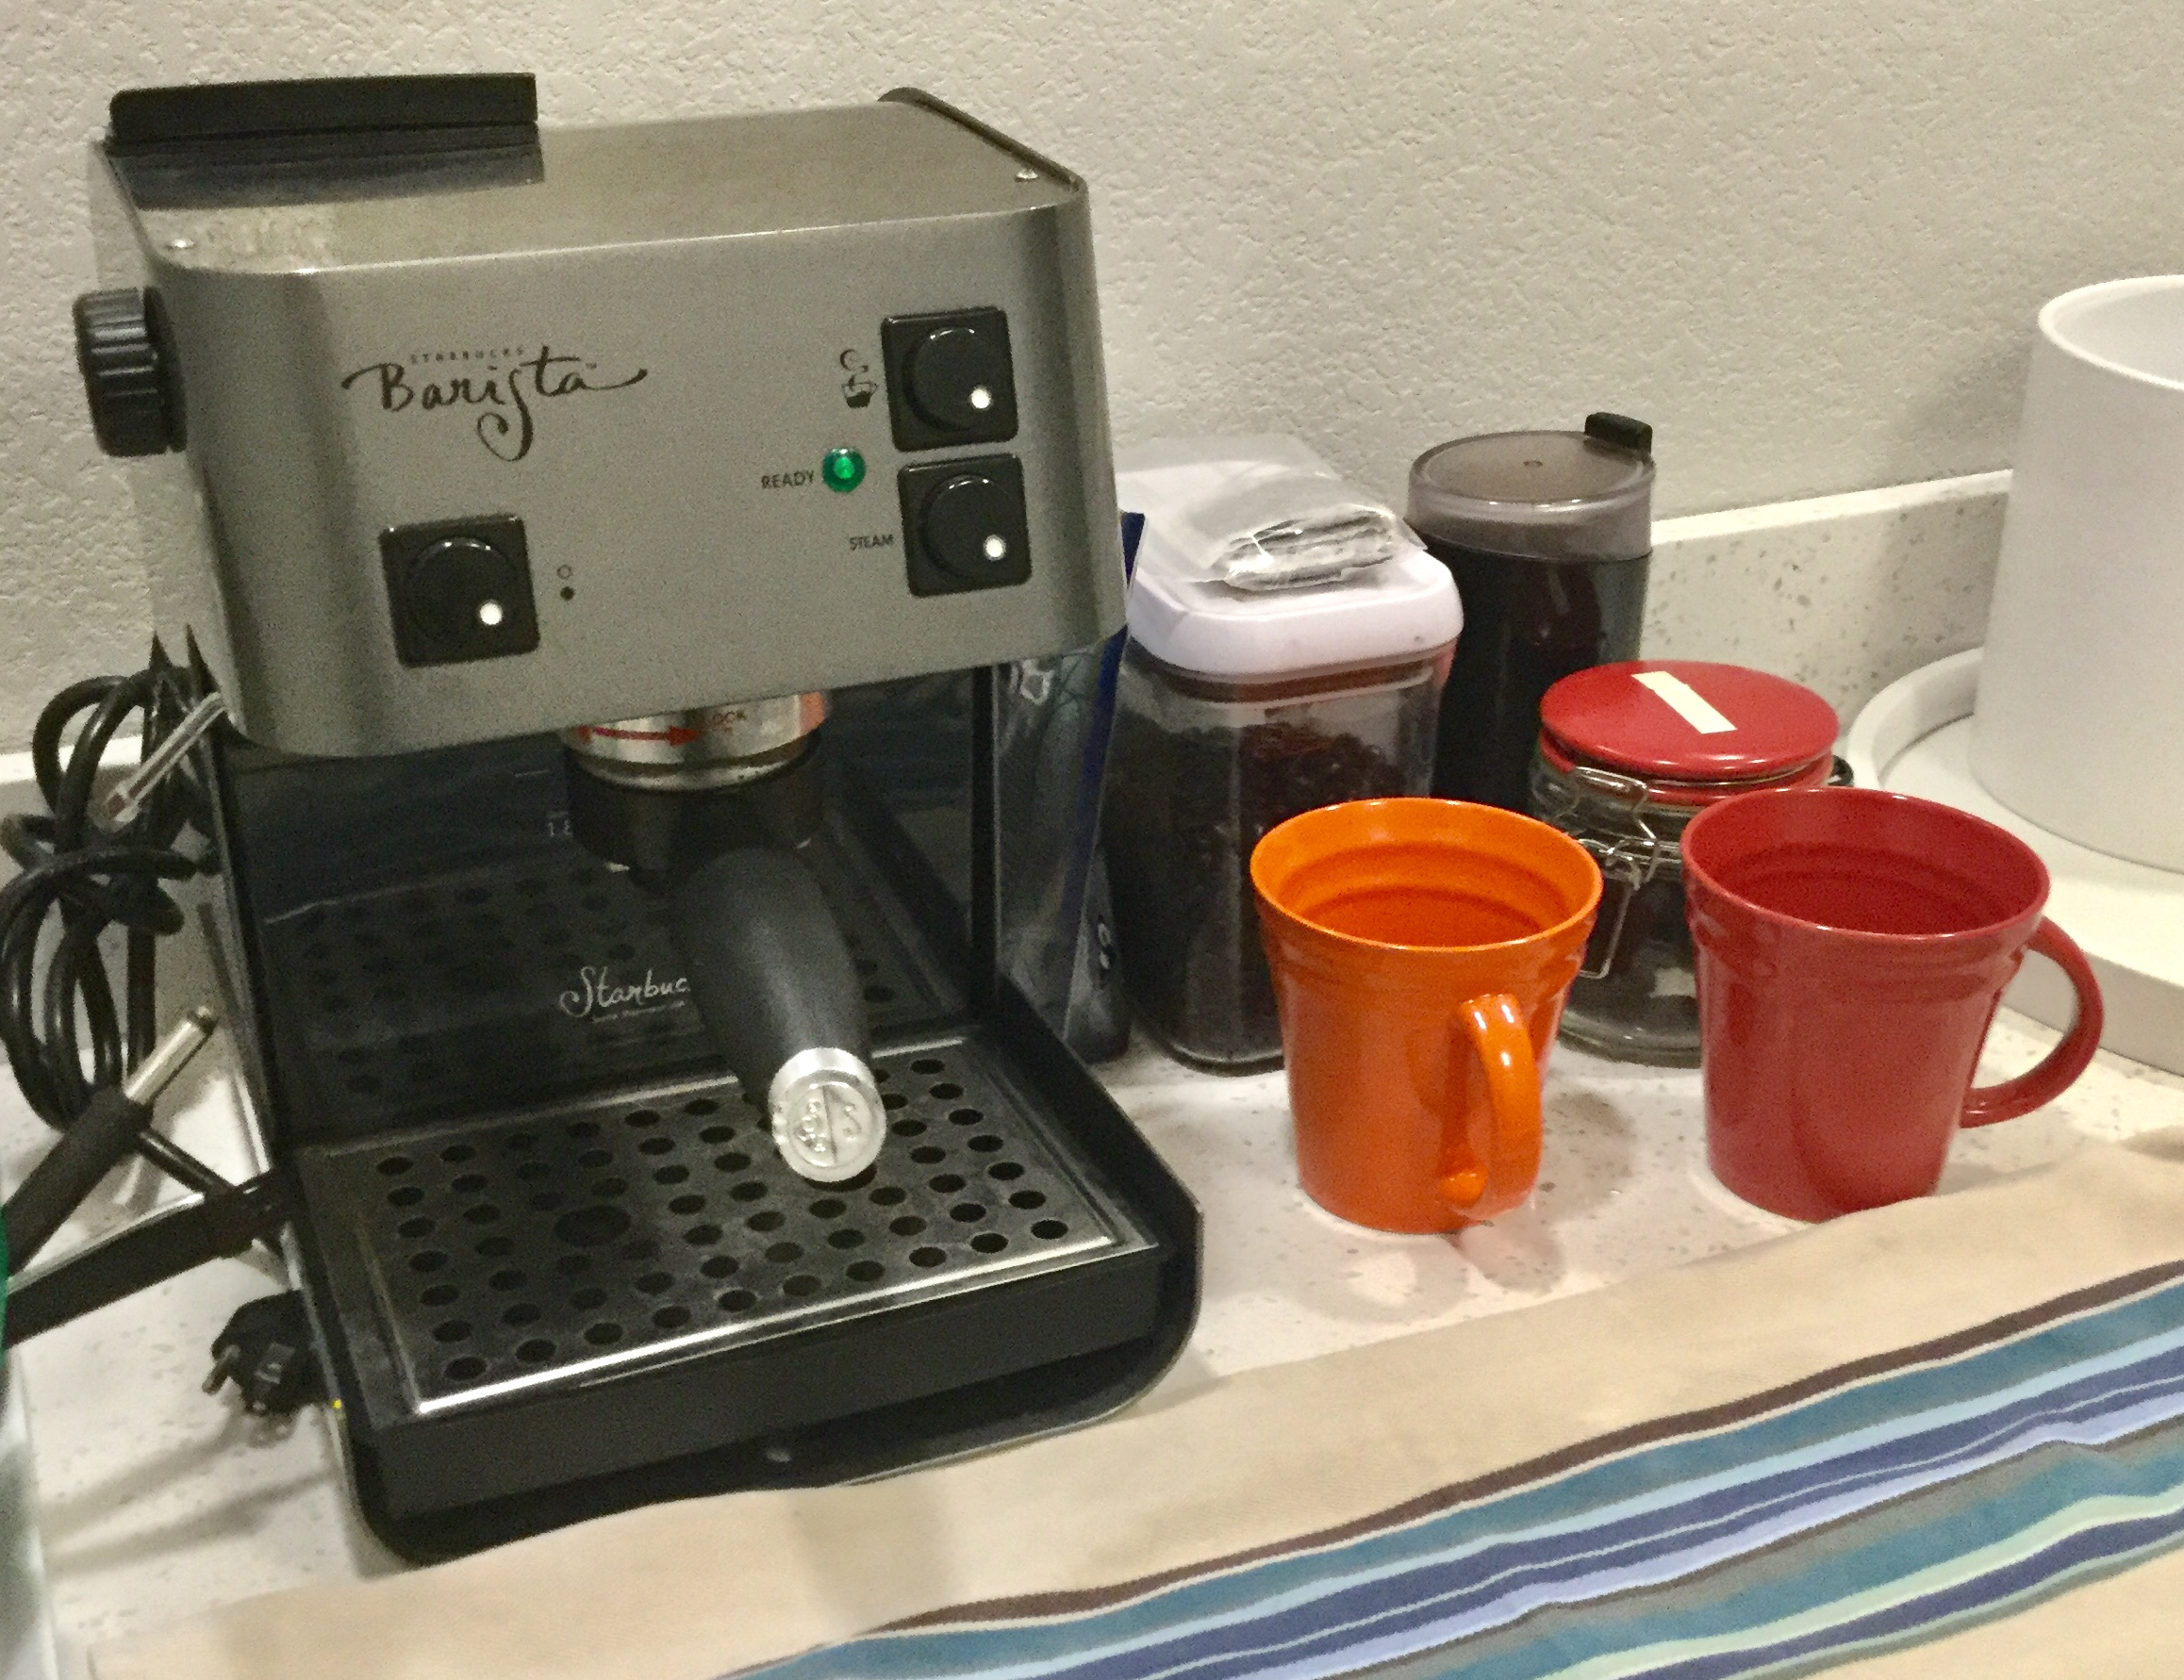 Bring-Your-Own-Espresso